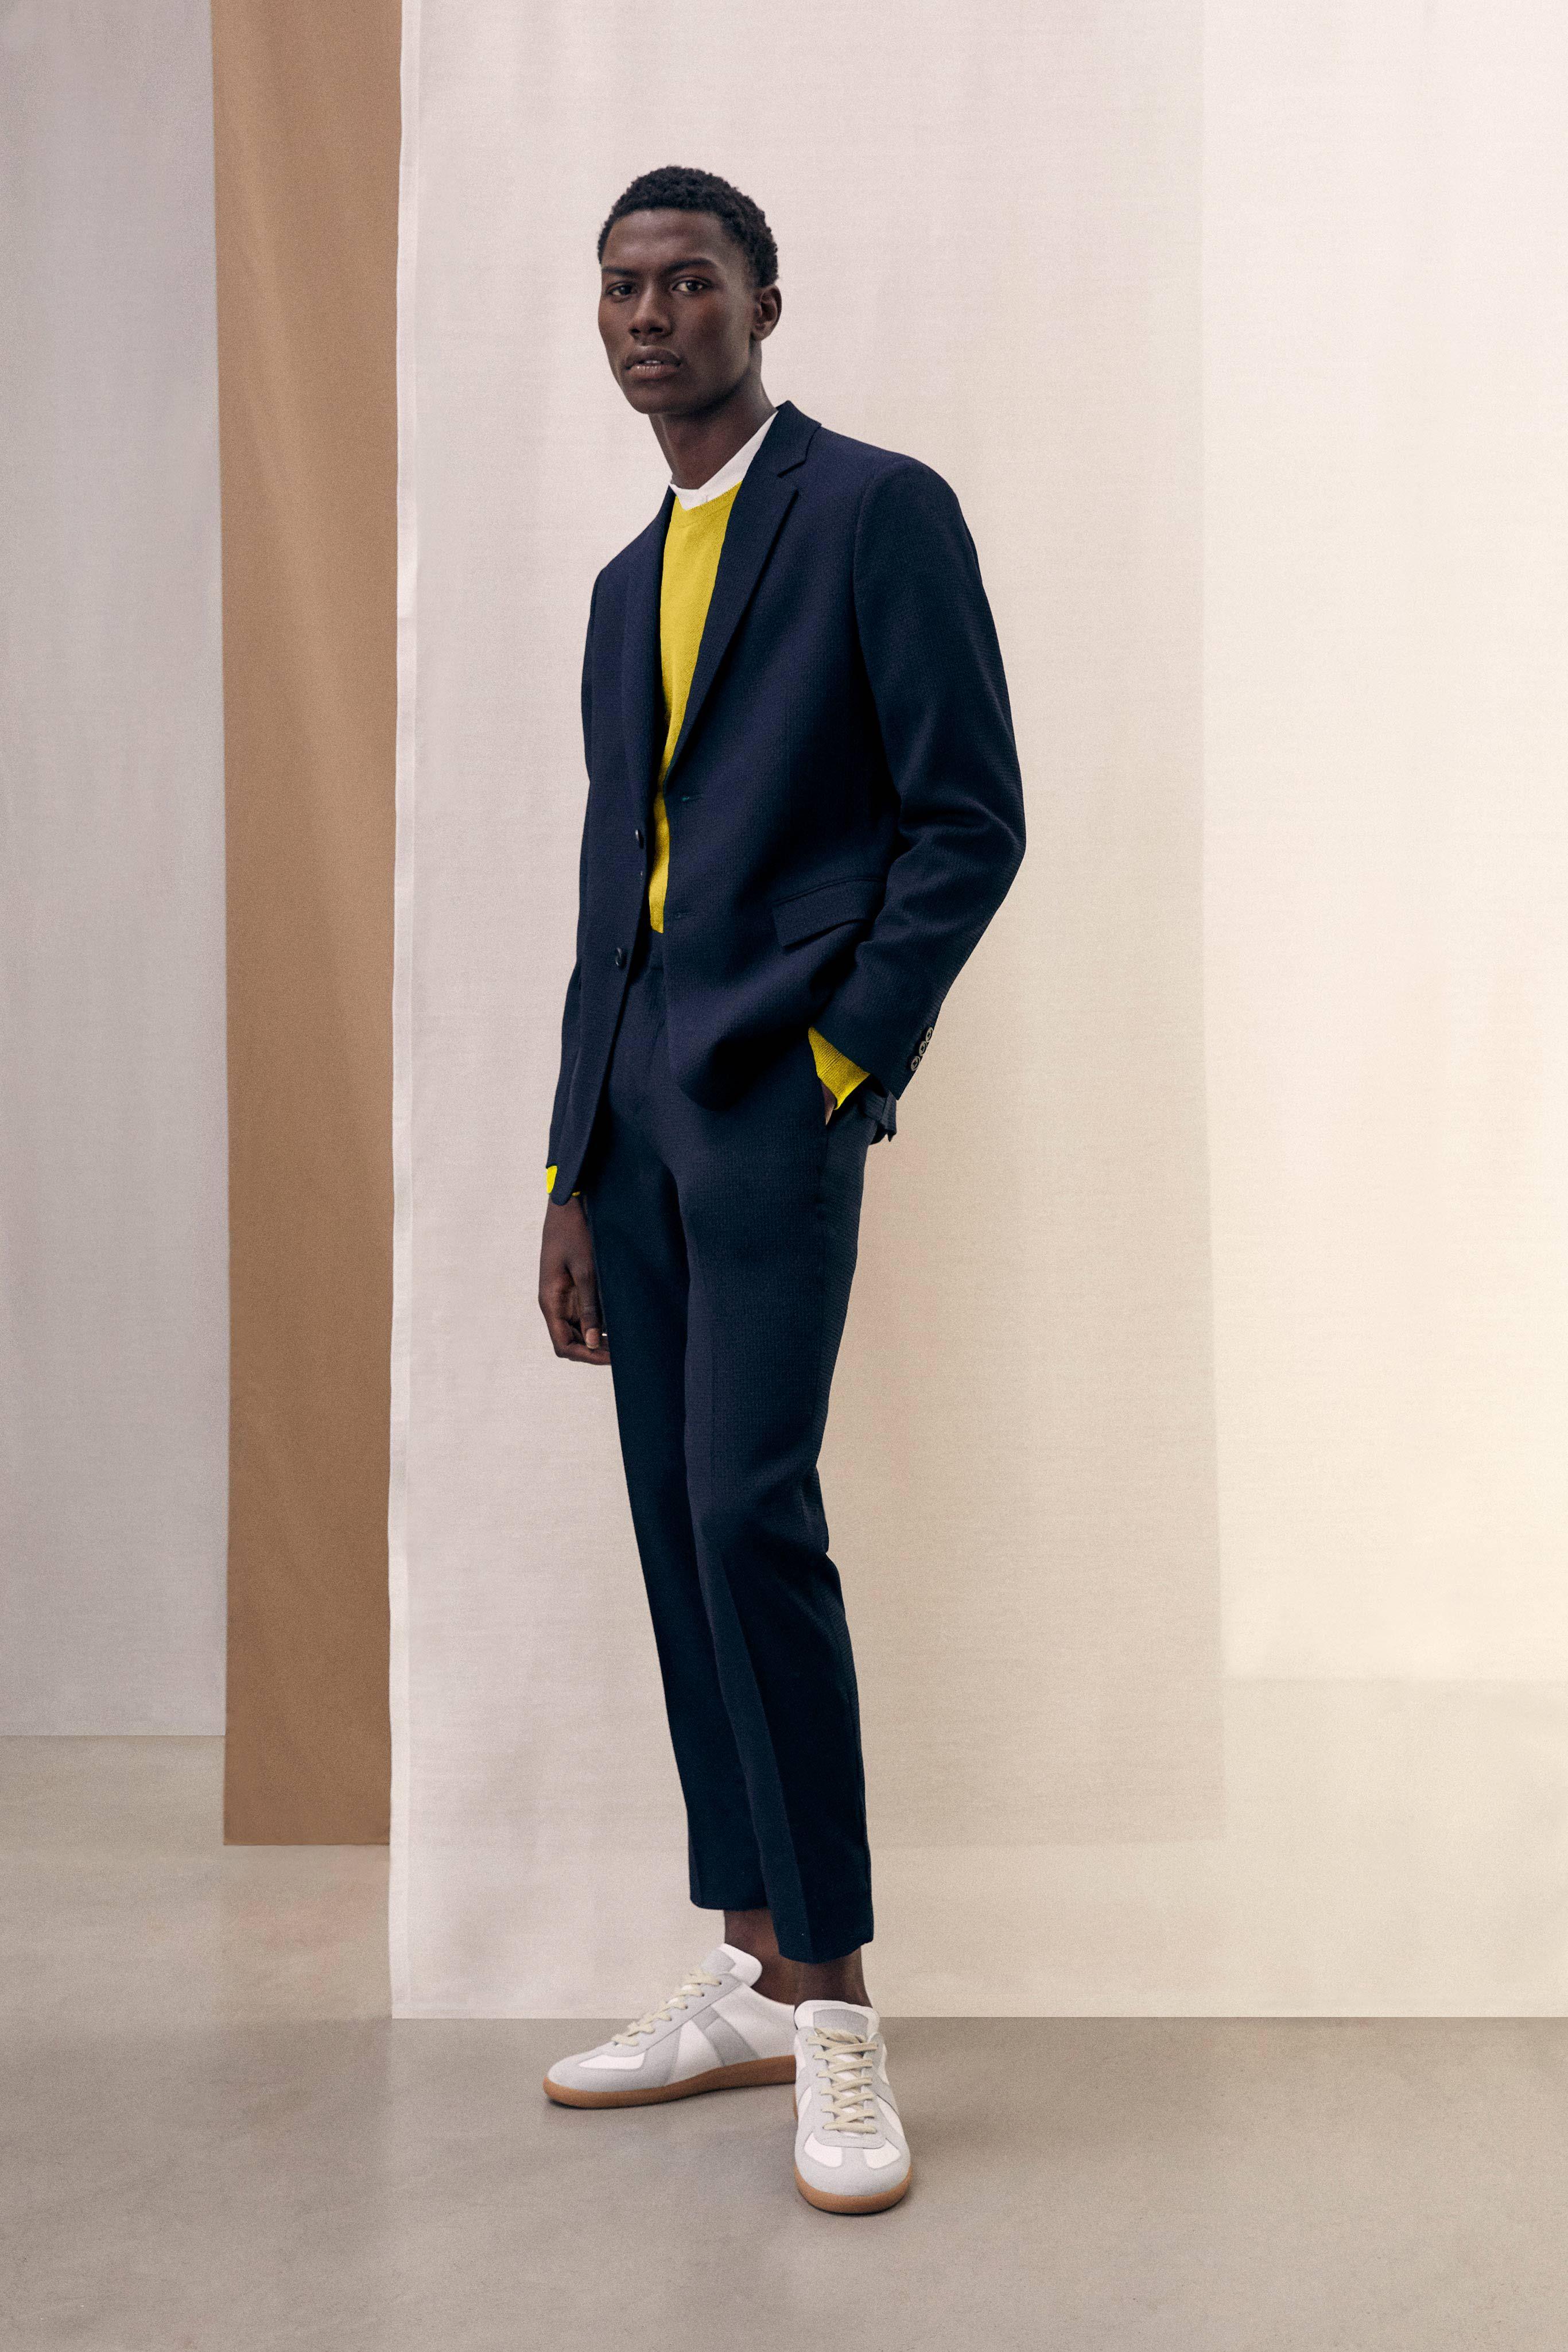 917a7722b9 Theory Men's Spring 2019 | MENS WEAR--2019 | Fashion, Menswear, Spring